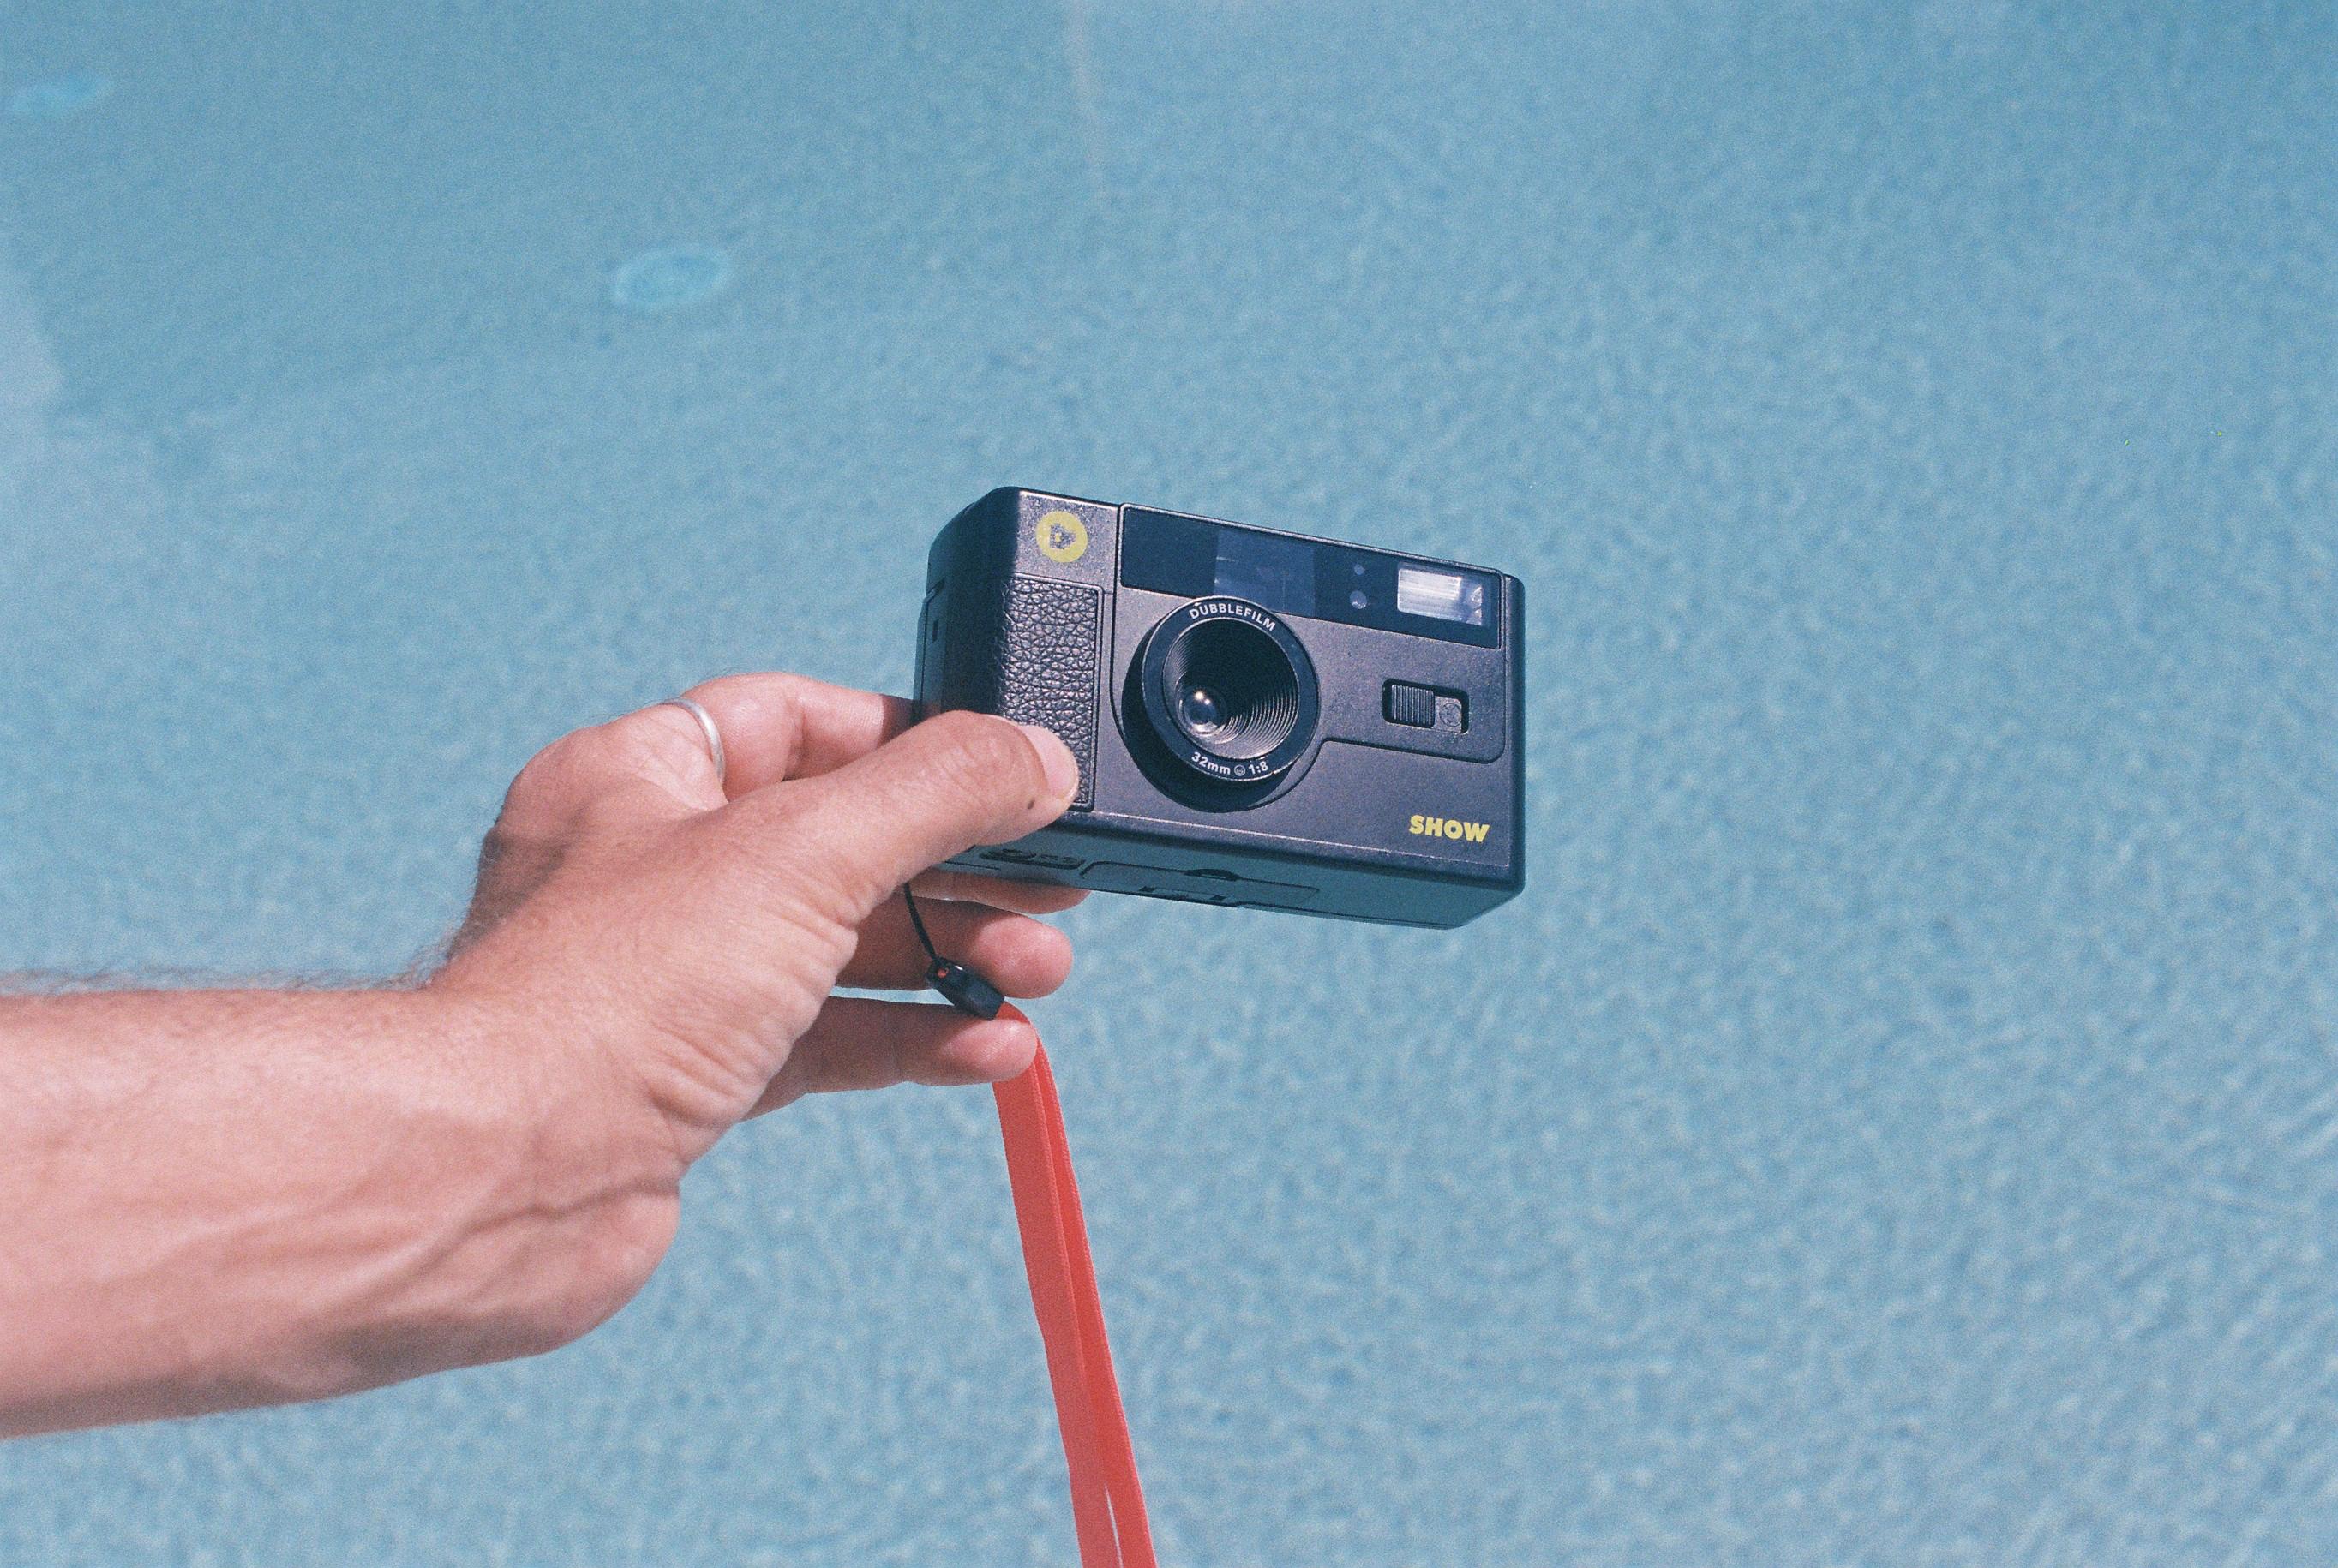 SHOW camera (Pic: Dubblefilm)